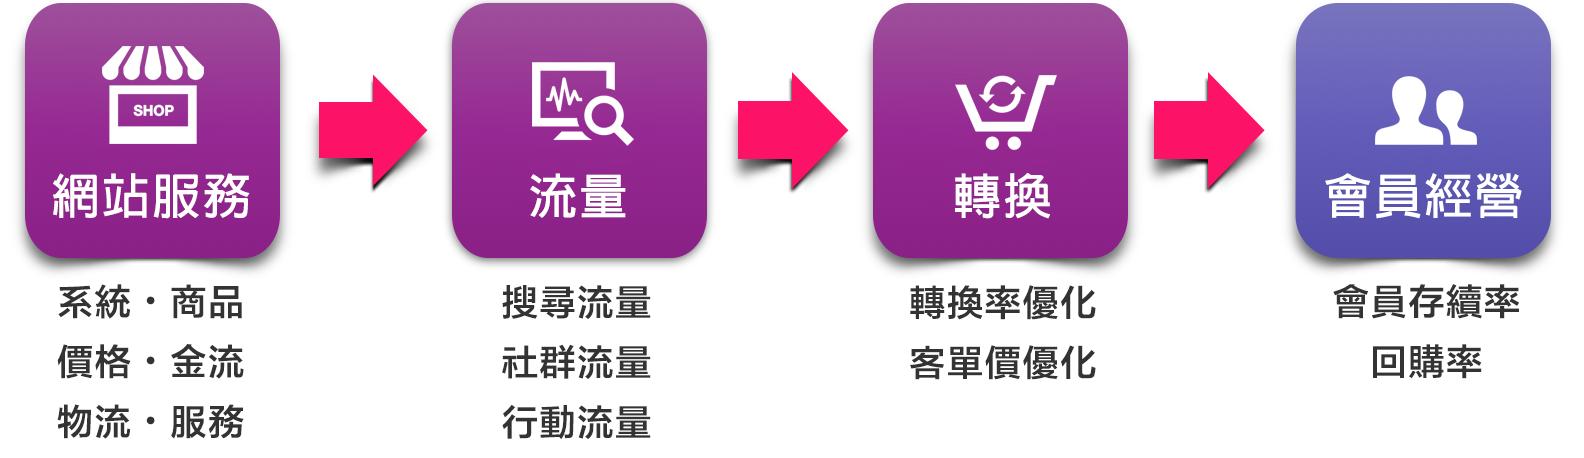 MMdc 電子商務簡介